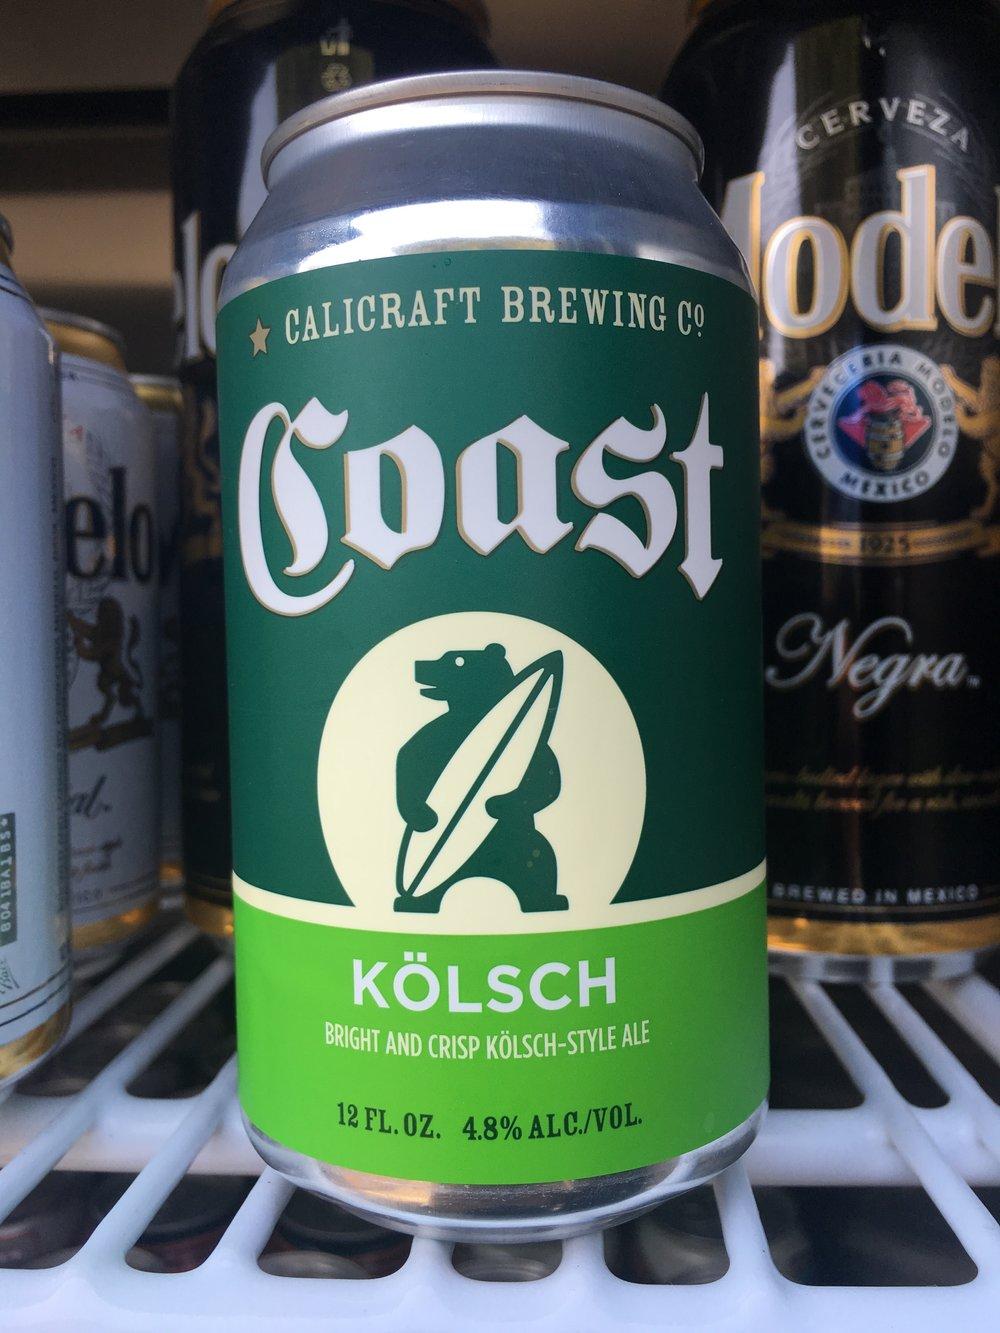 Calicraft Brewing - Coast Kolsch